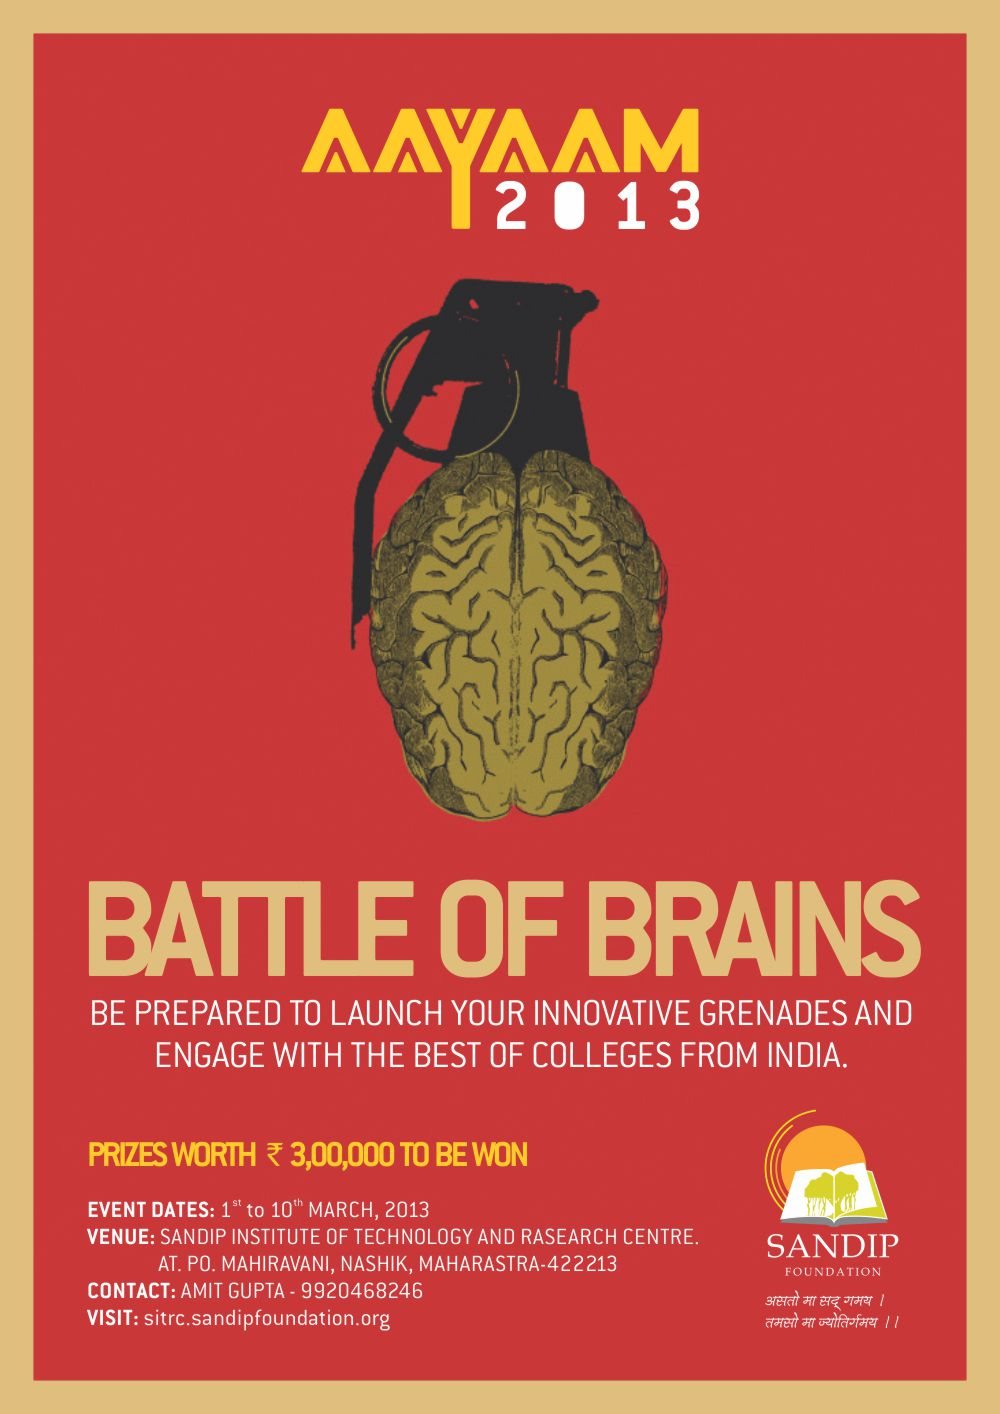 AAYAAM 2013 - Battle of Brains- Sandip Institute of Technology & Research Centre (SITRC)